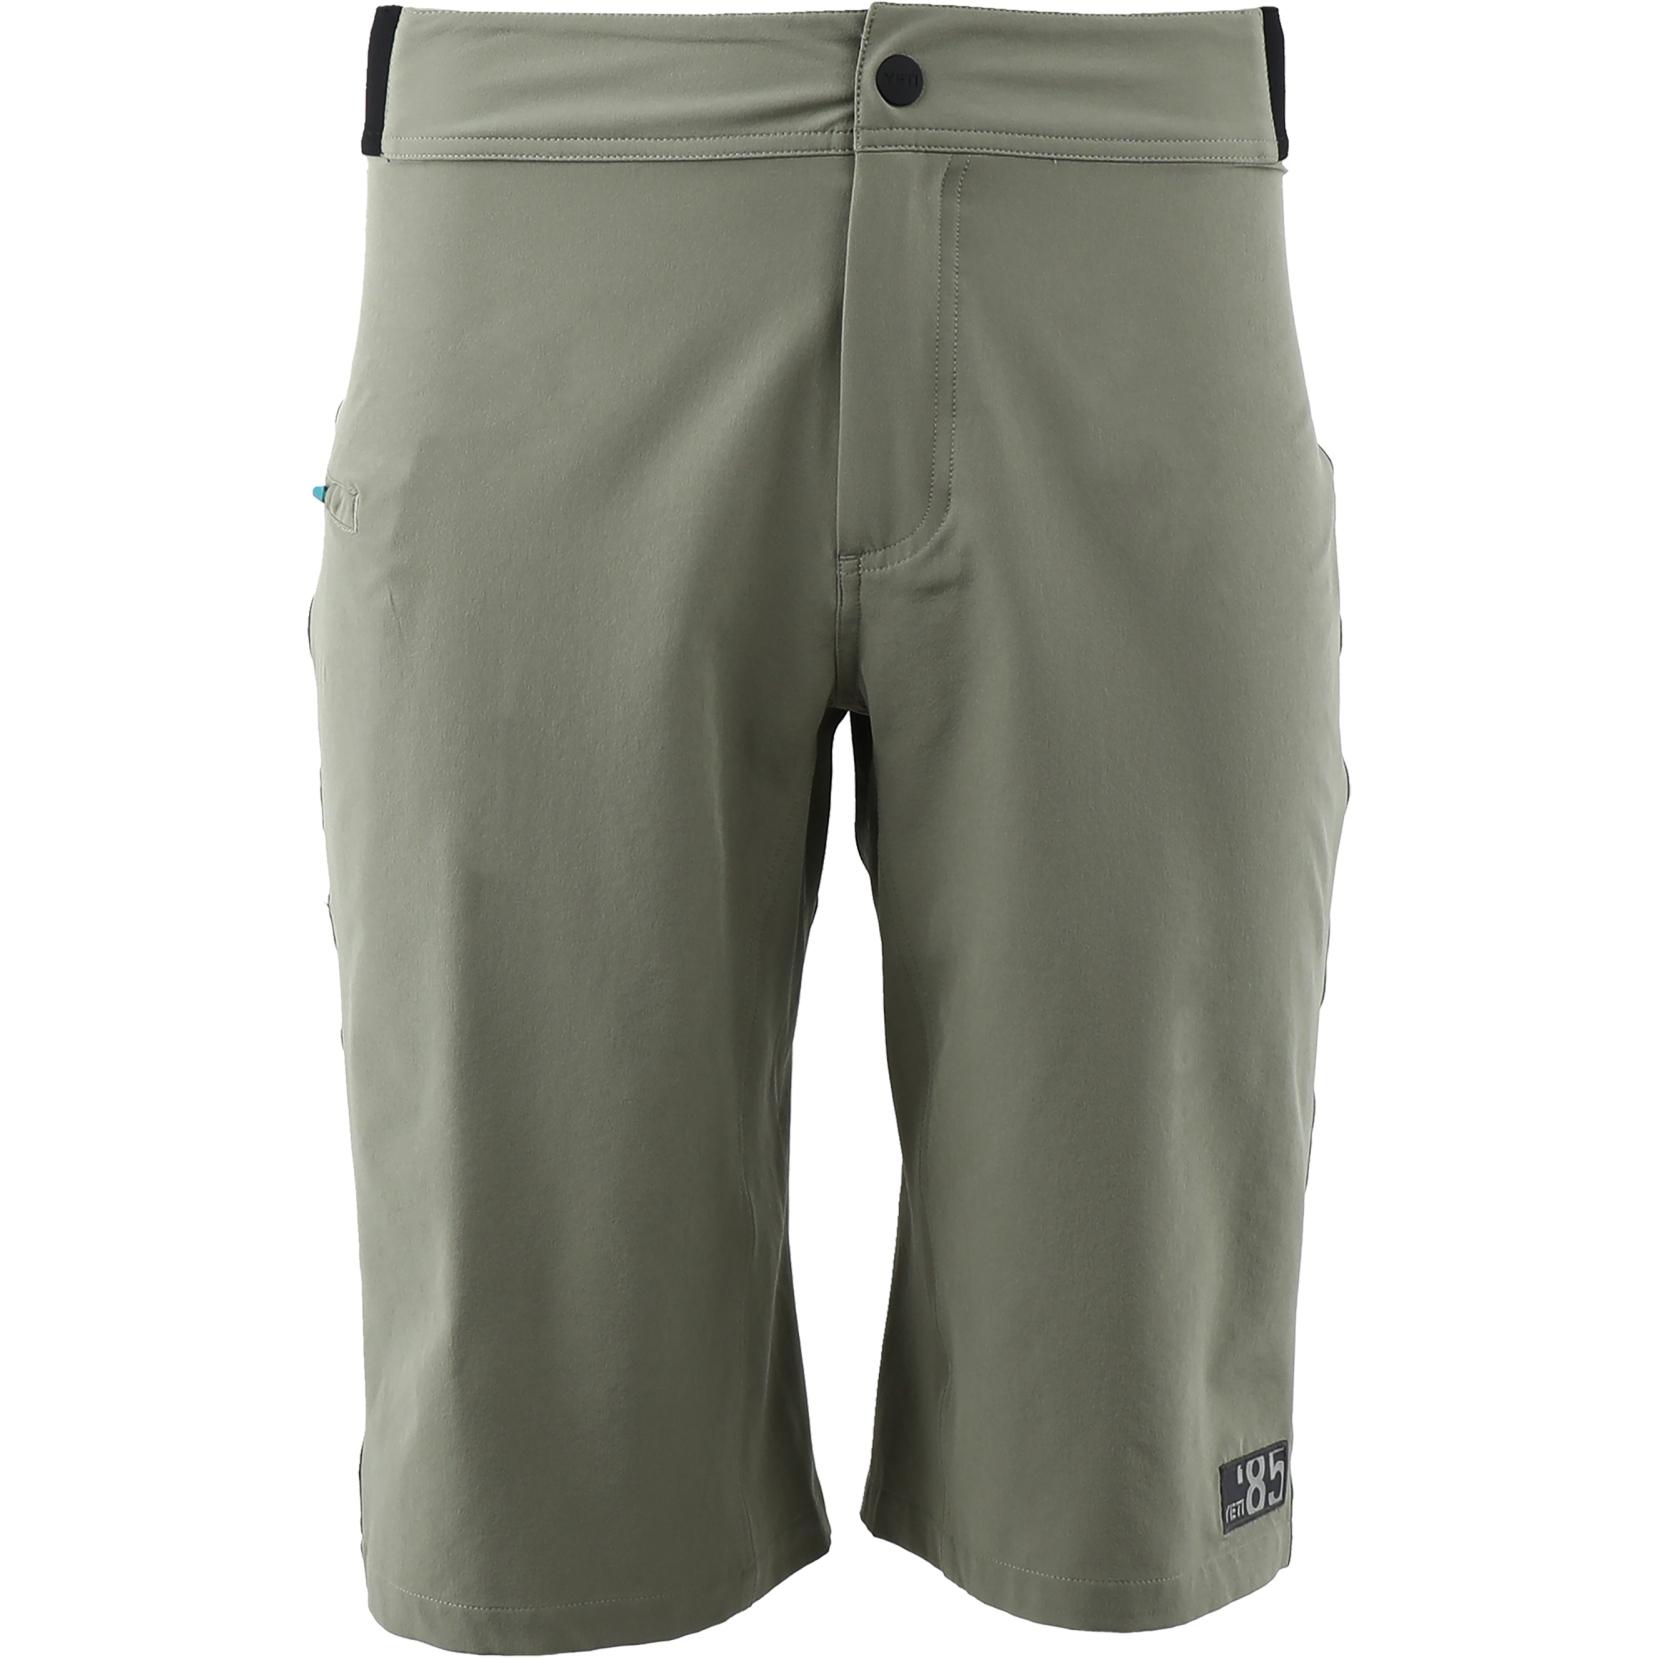 Yeti Cycles Rustler Shorts - Moss